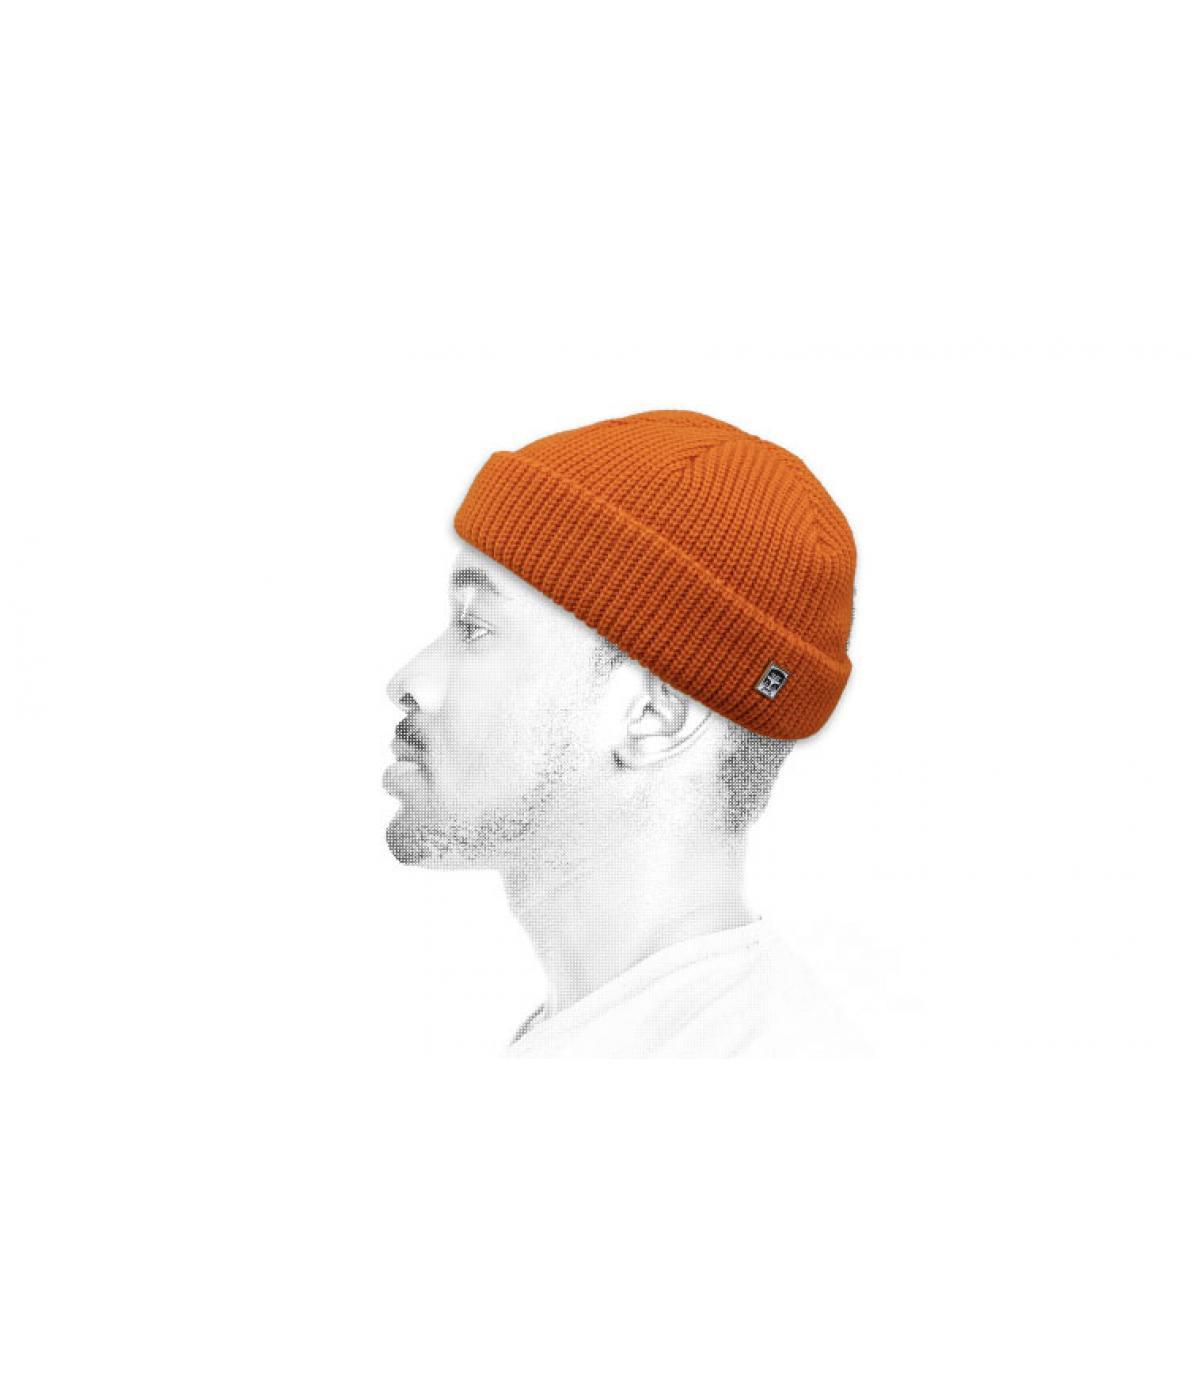 Obey cappello docker arancione